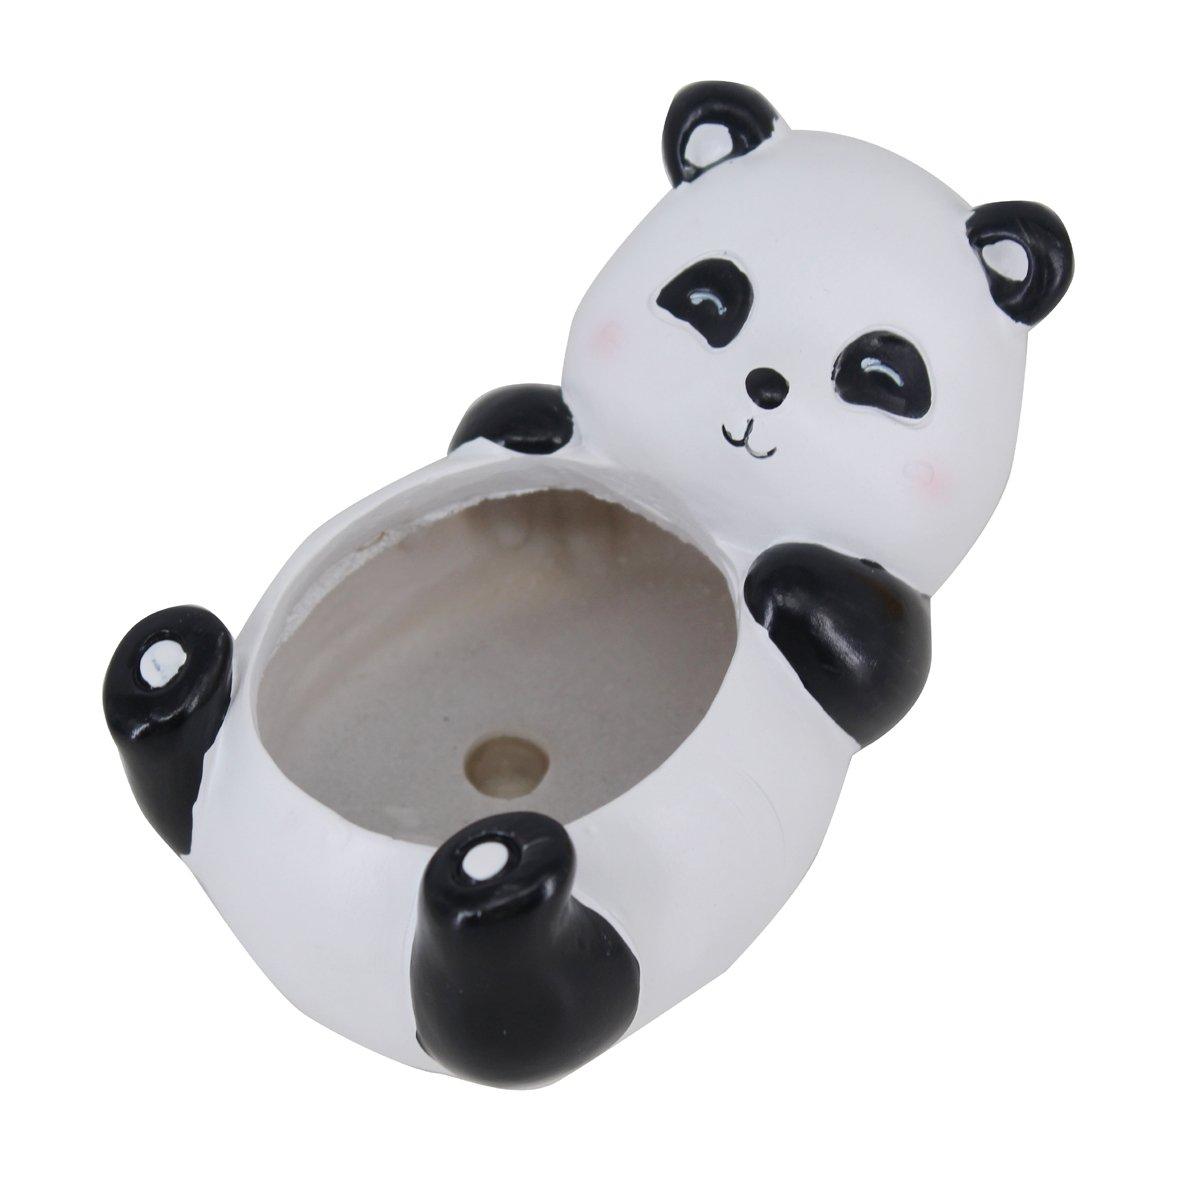 Greatflower Cute Panda Resin Animal Succulent Pot for Artificial Succulent arrangement